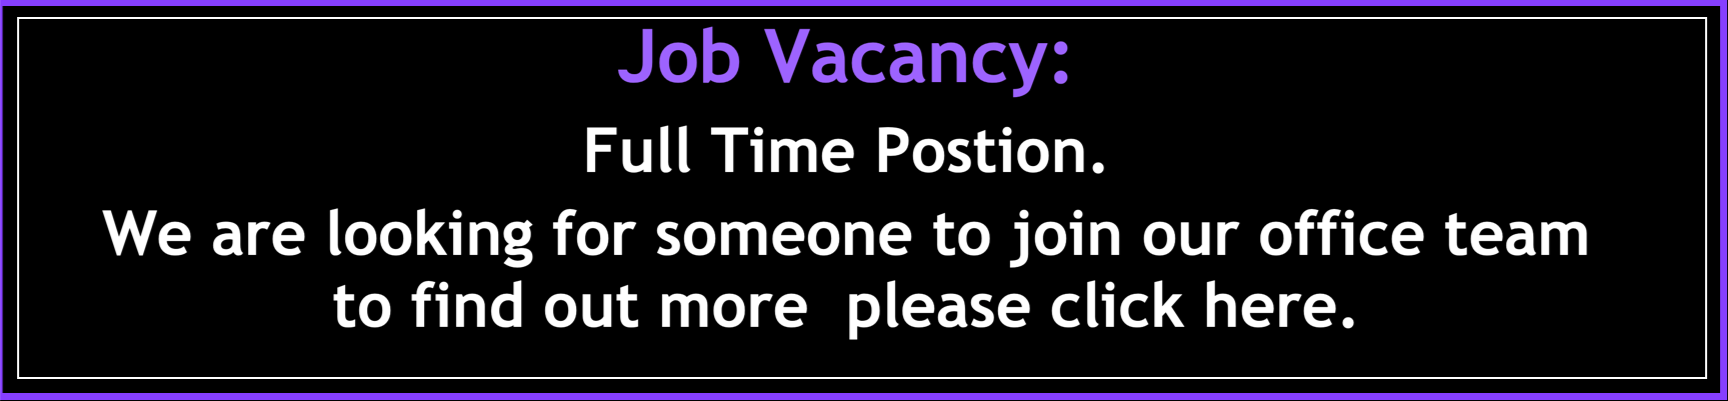 job-banner.png